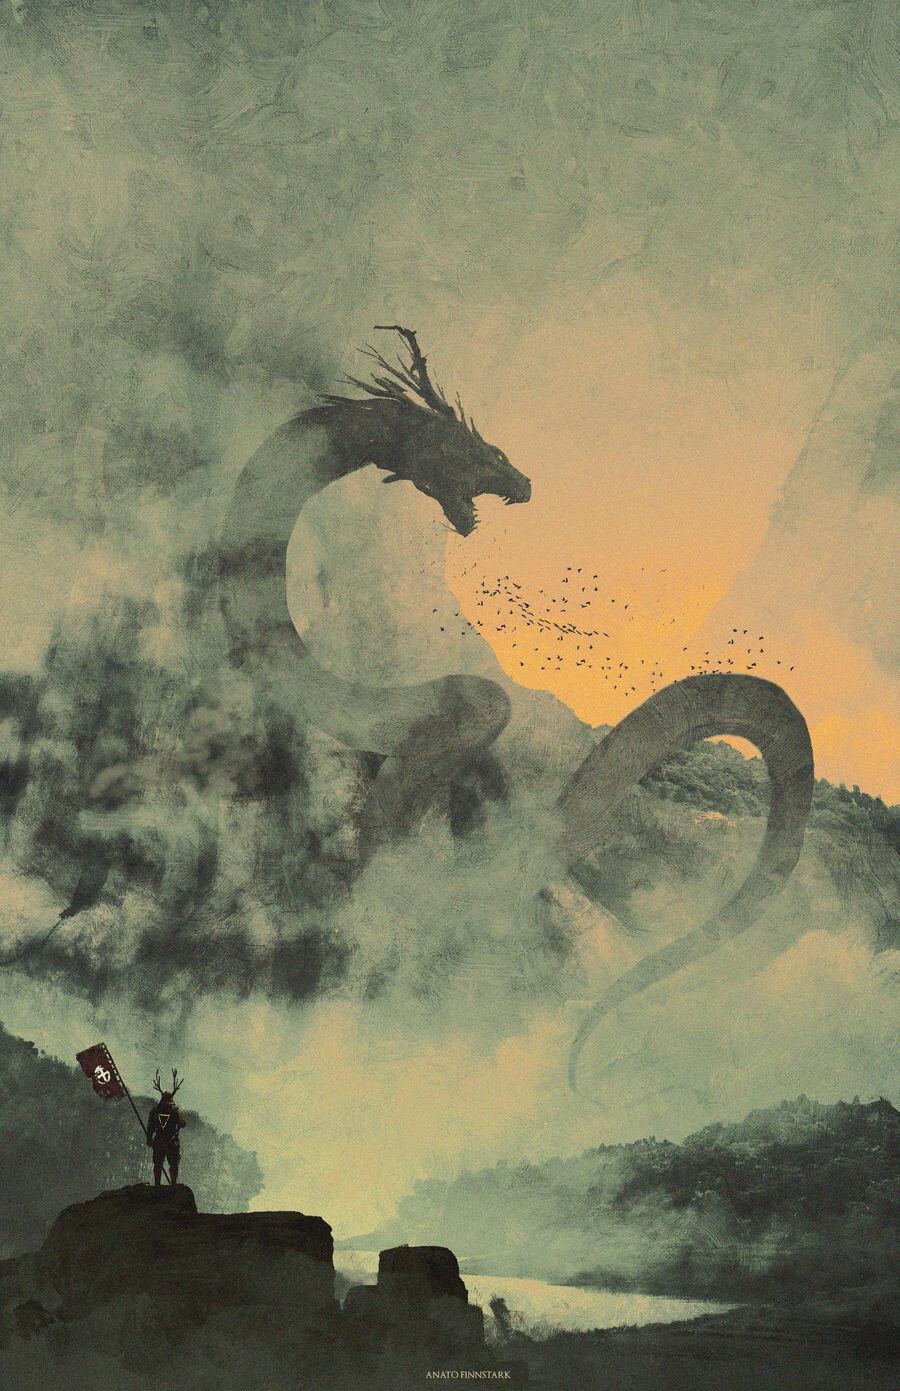 Anato finnstark anato finnstark the dragon s gate by anatofinnstark dcuwcki fullview